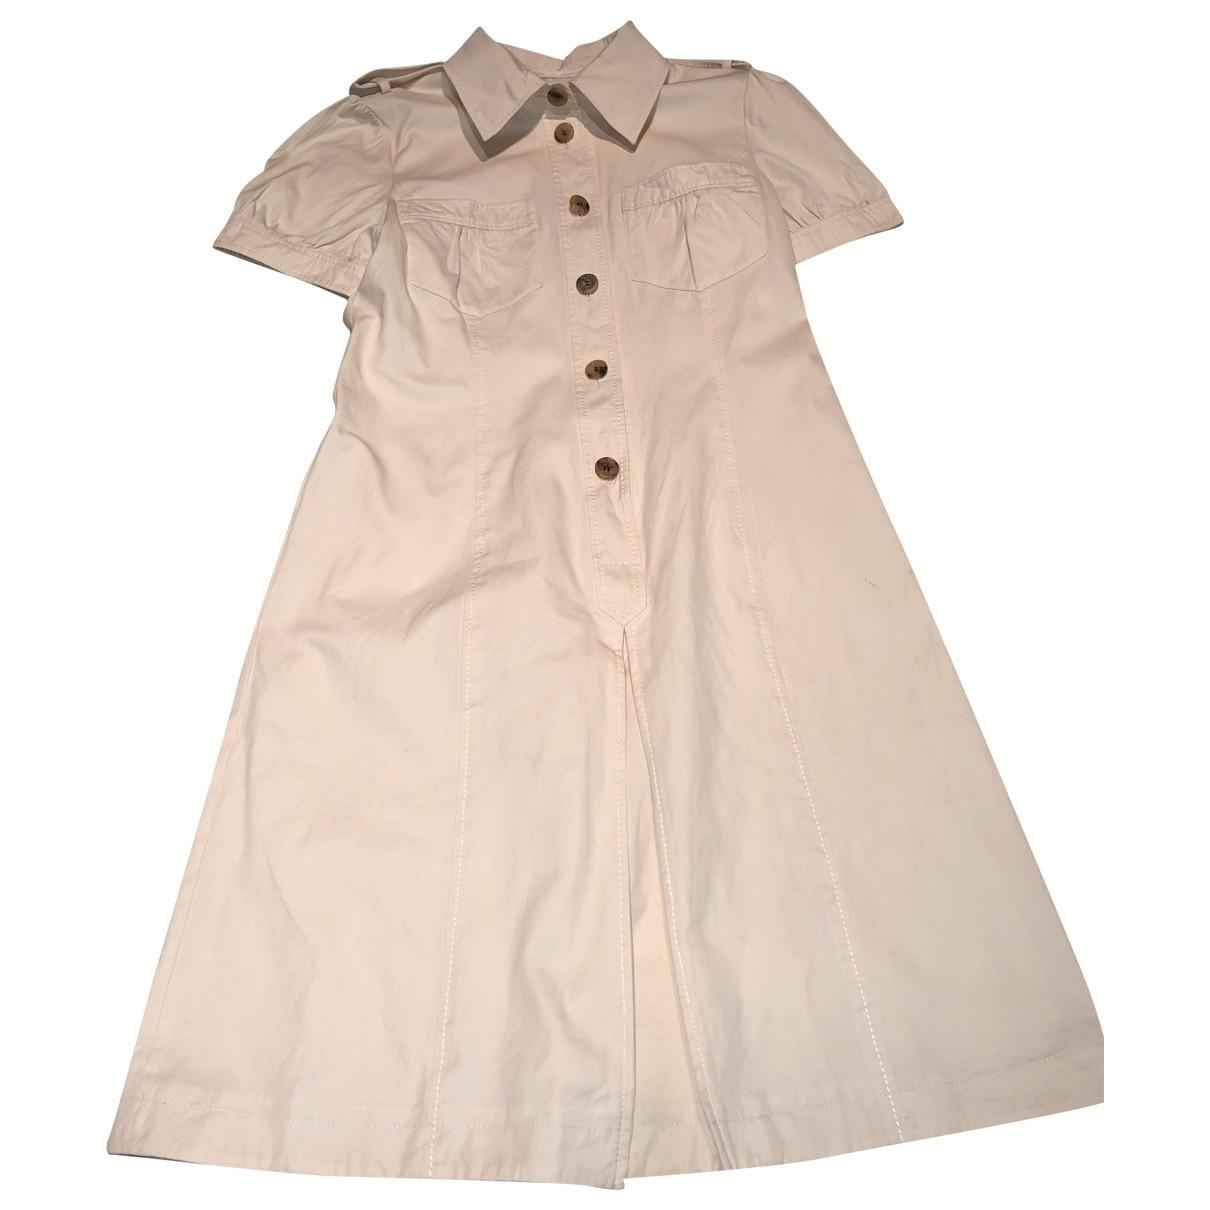 Valentino Garavani \N Beige dress for Women 12 UK